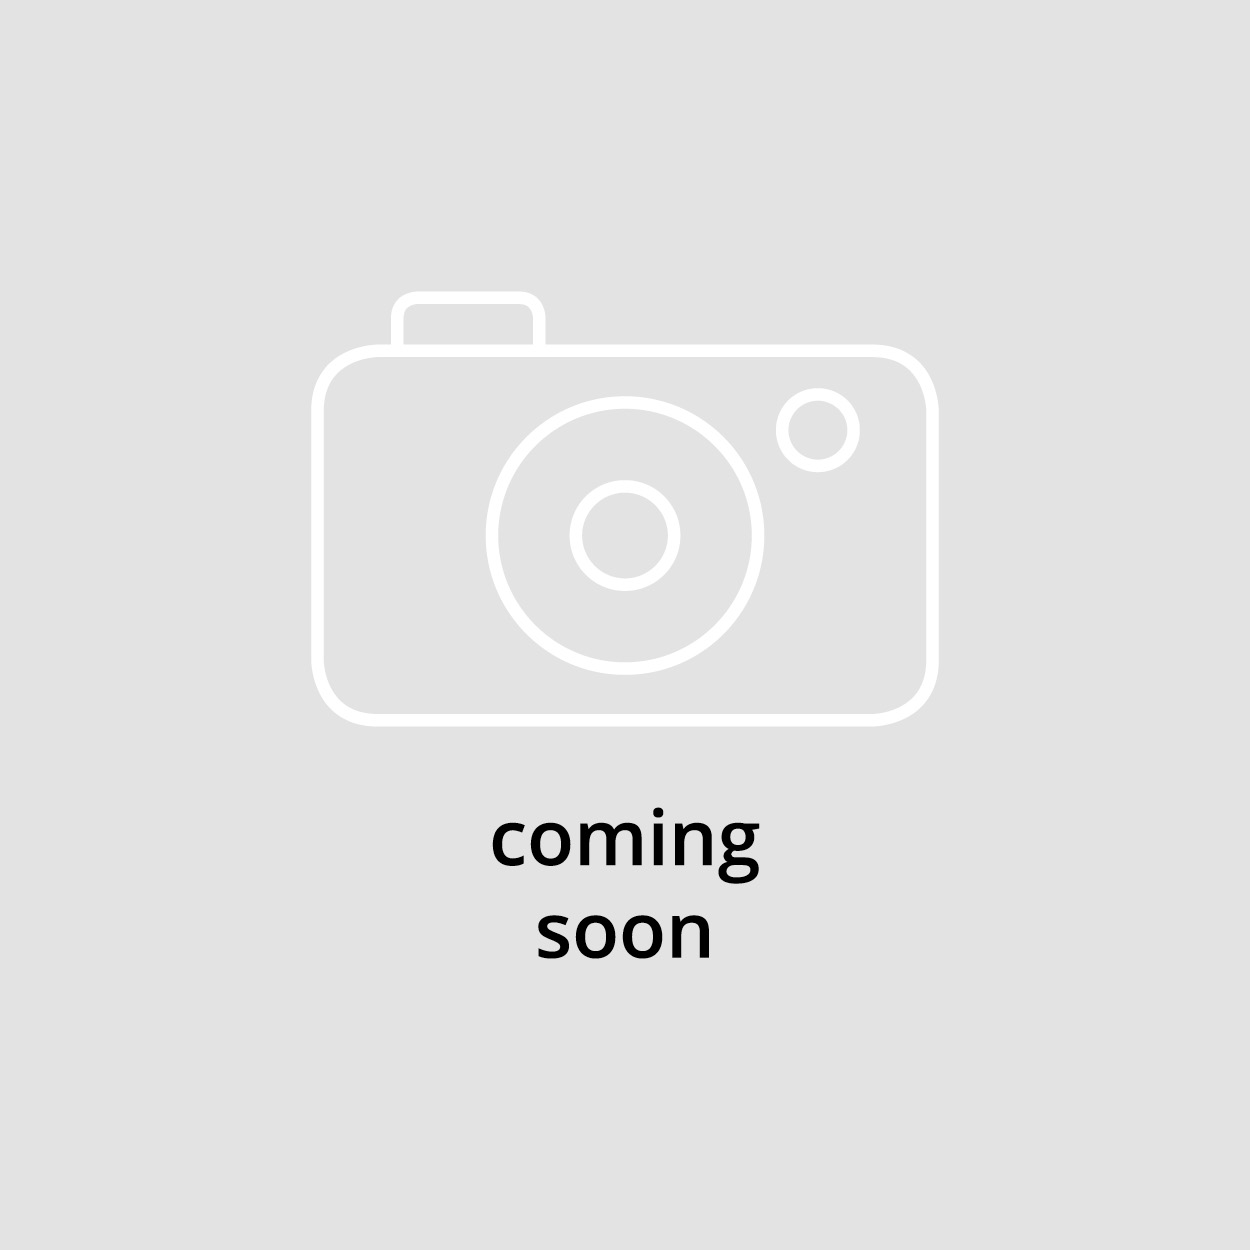 15.04.106 Rullino per eccentrico  Gildemeister AS20, GS20, GM20, GM20AC